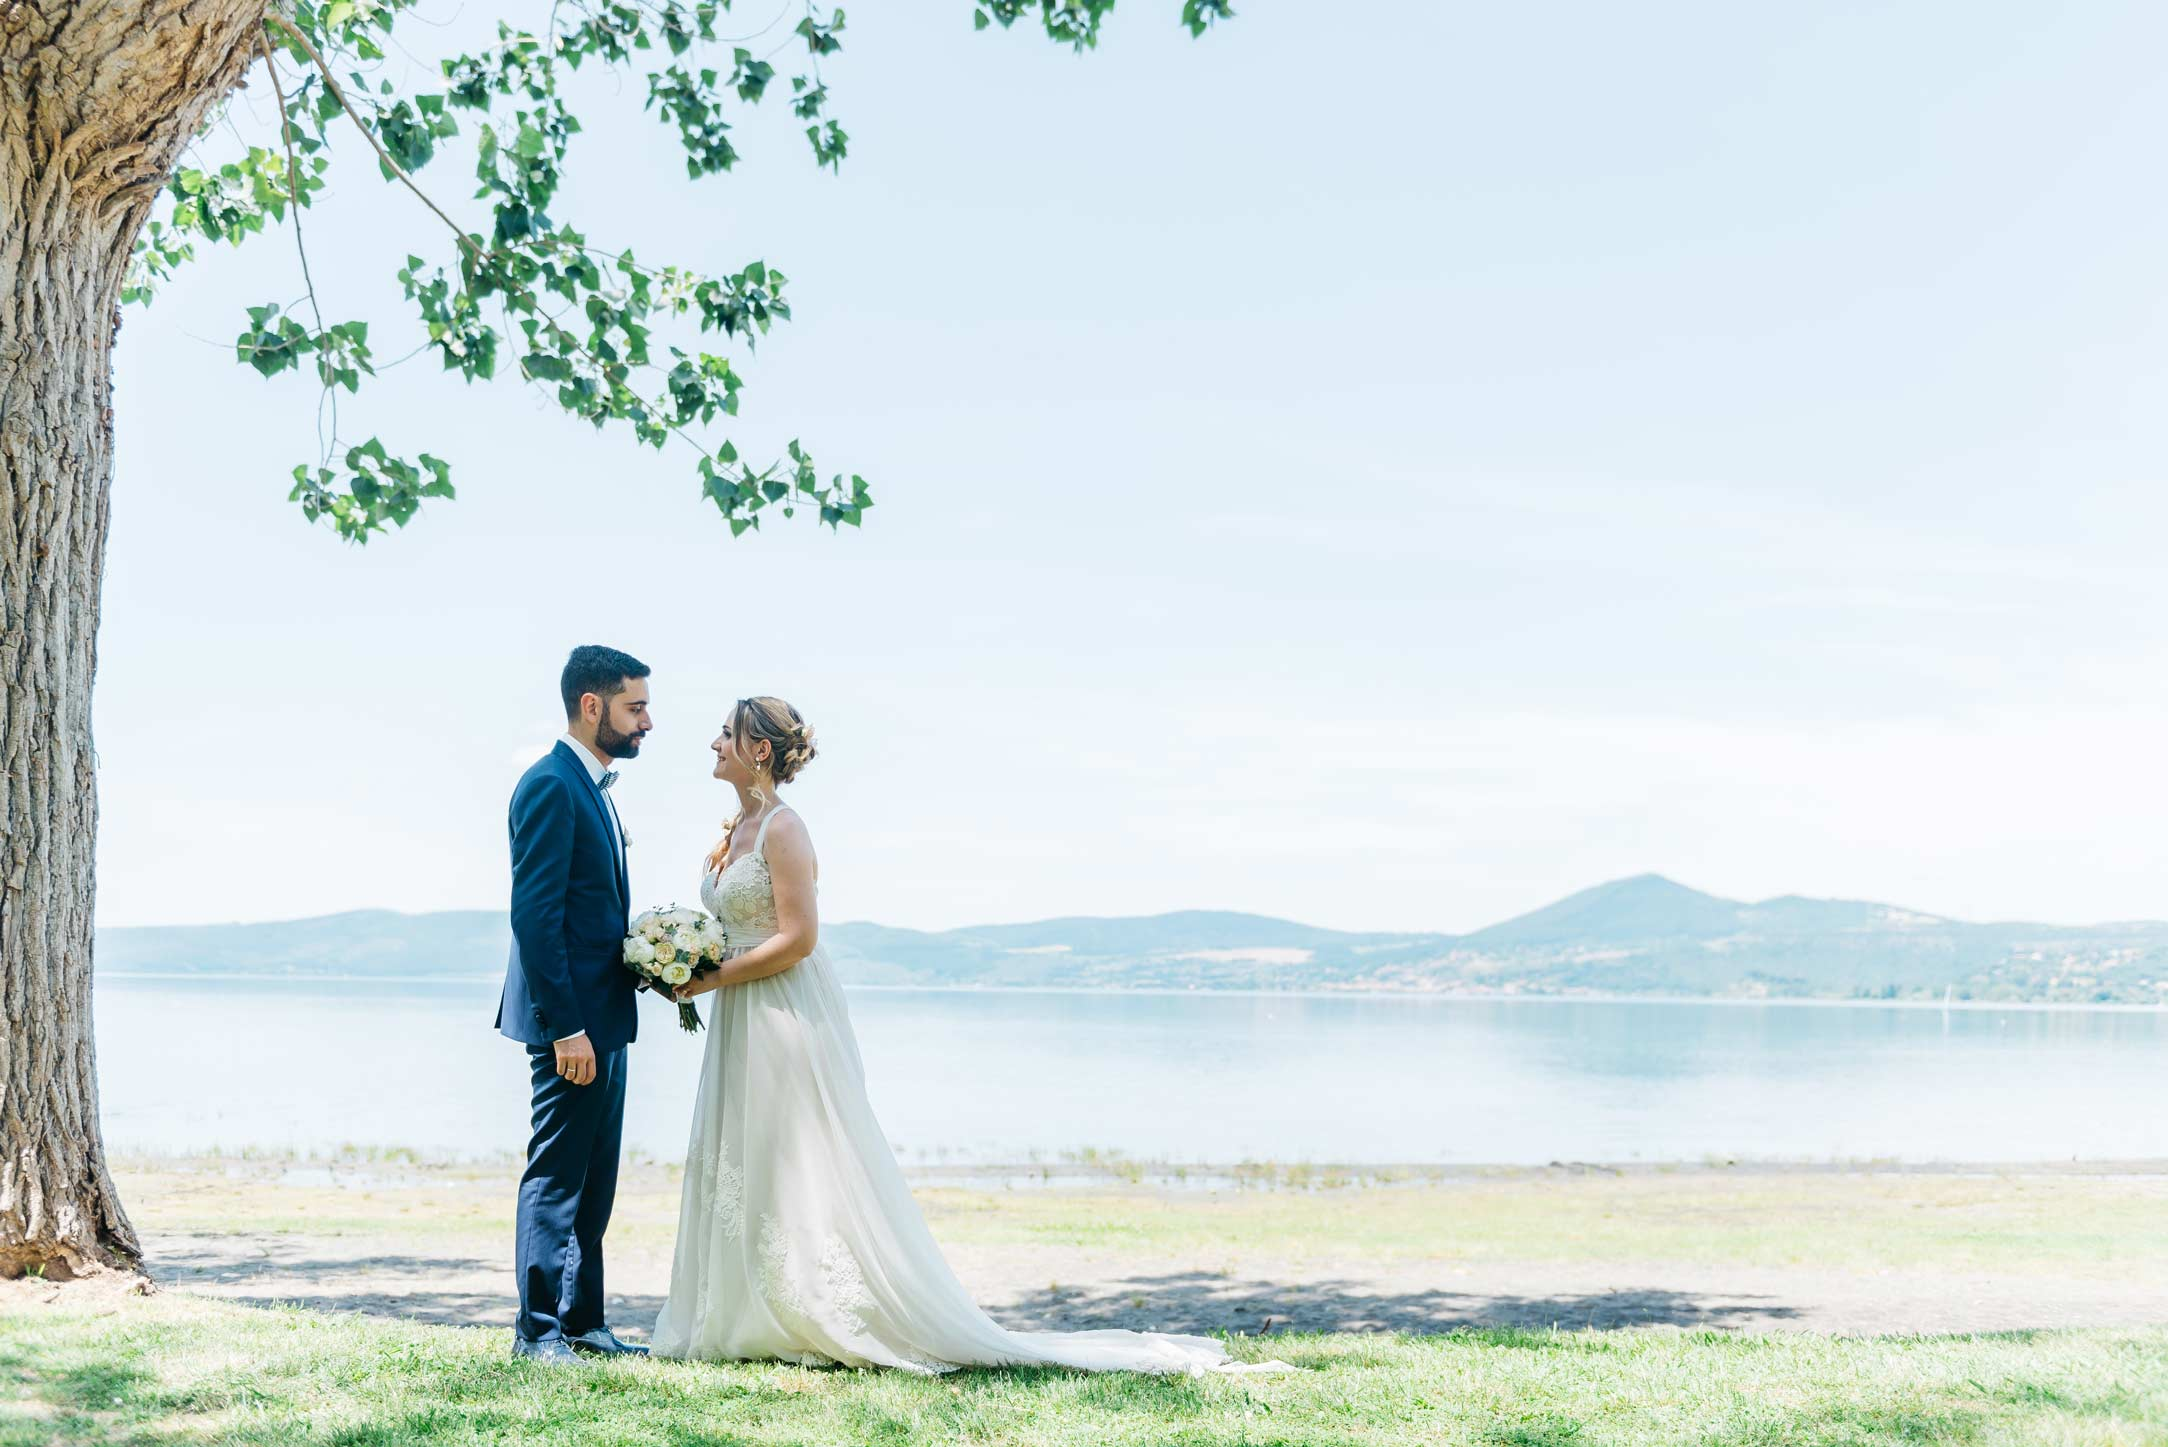 Reportage-Wedding-Photography-Destination-Wedding-Italy-Portraits